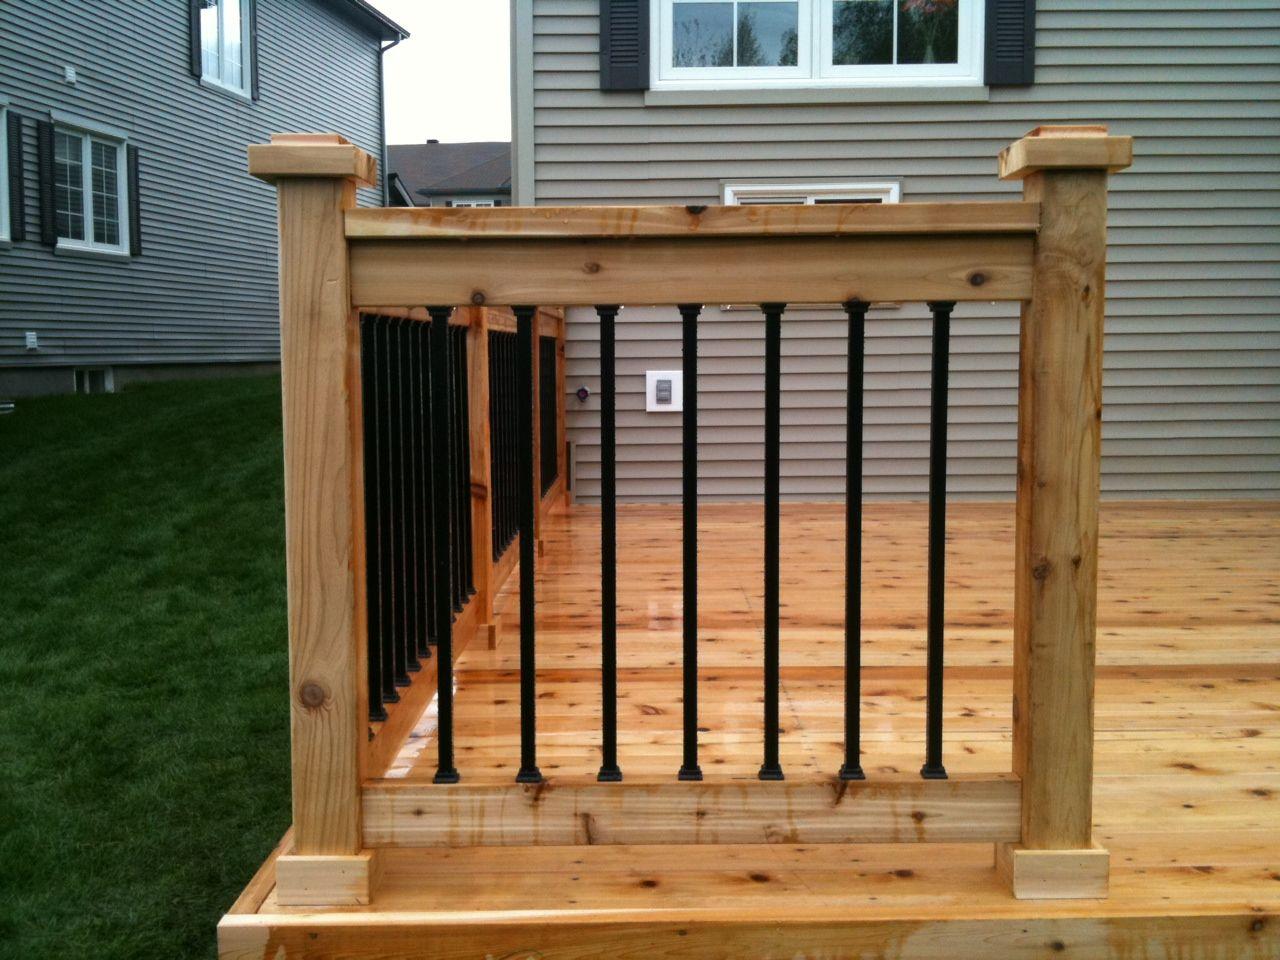 Deck Lattice The Deck Company Ottawa Deck And Fence Builders Contractors Outdoor Decor Backyard Decks And Porches Cedar Deck